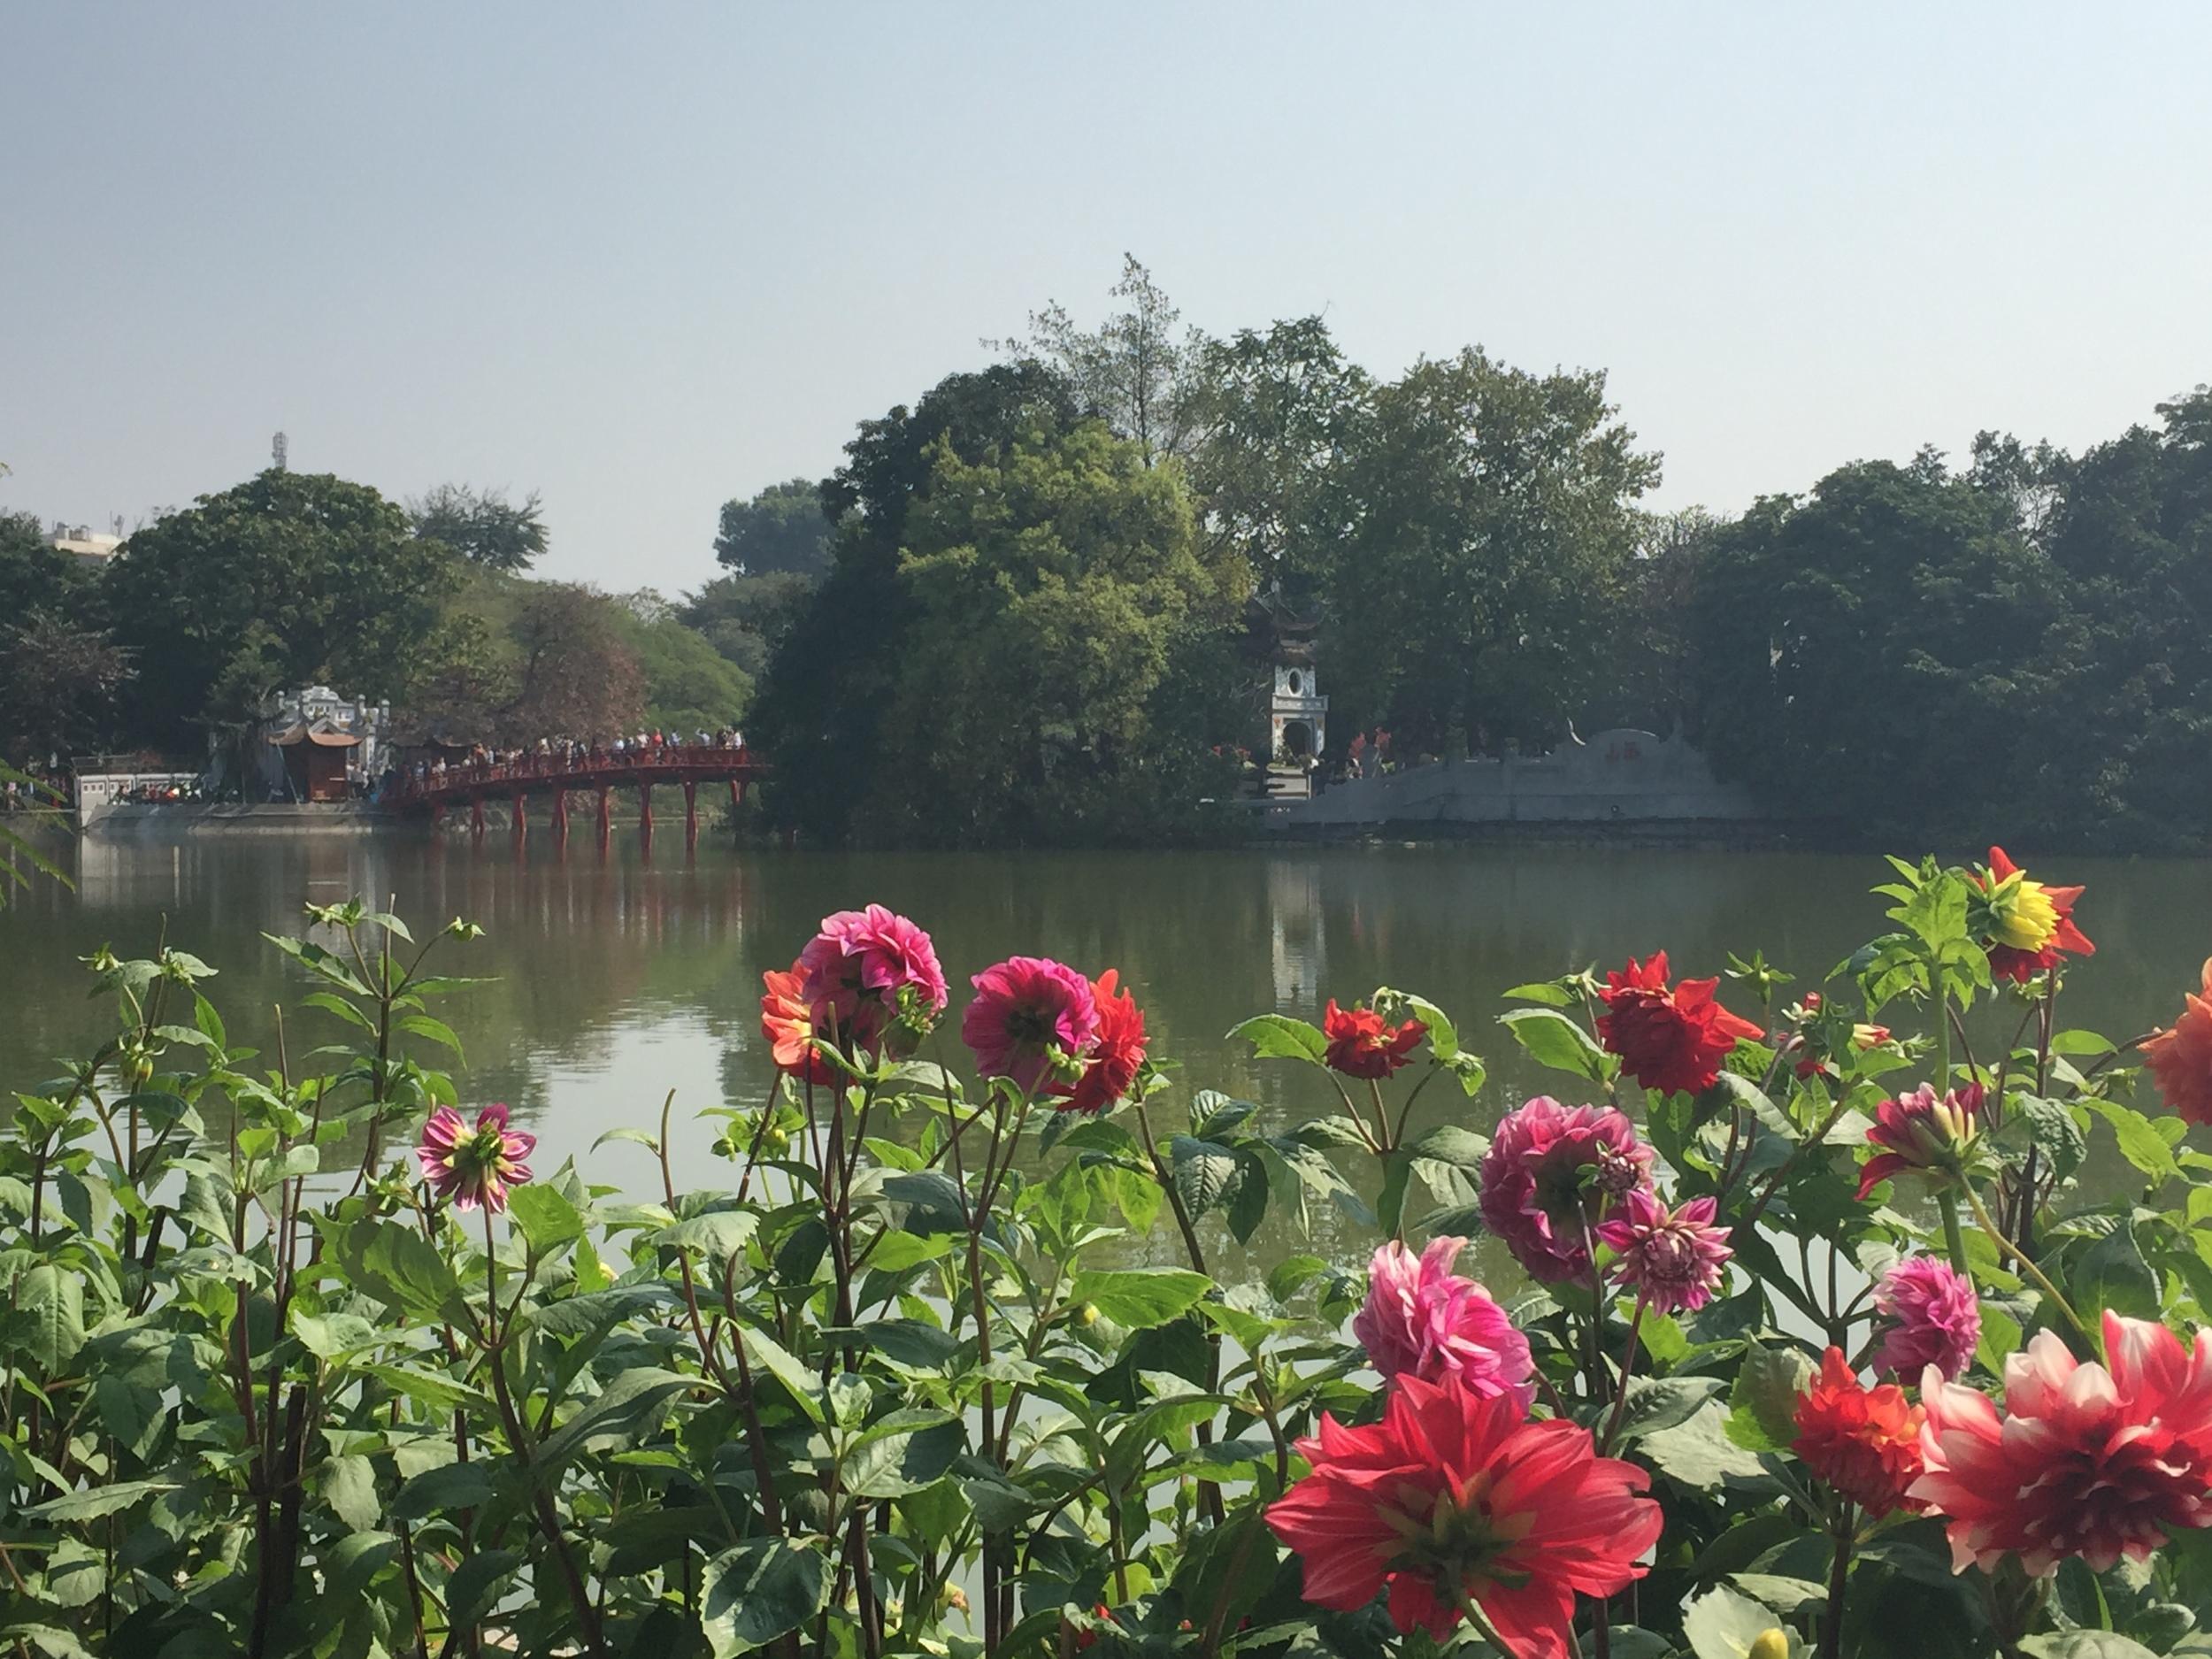 Pretty lake in the historic center of Hanoi. Pretty flowers.